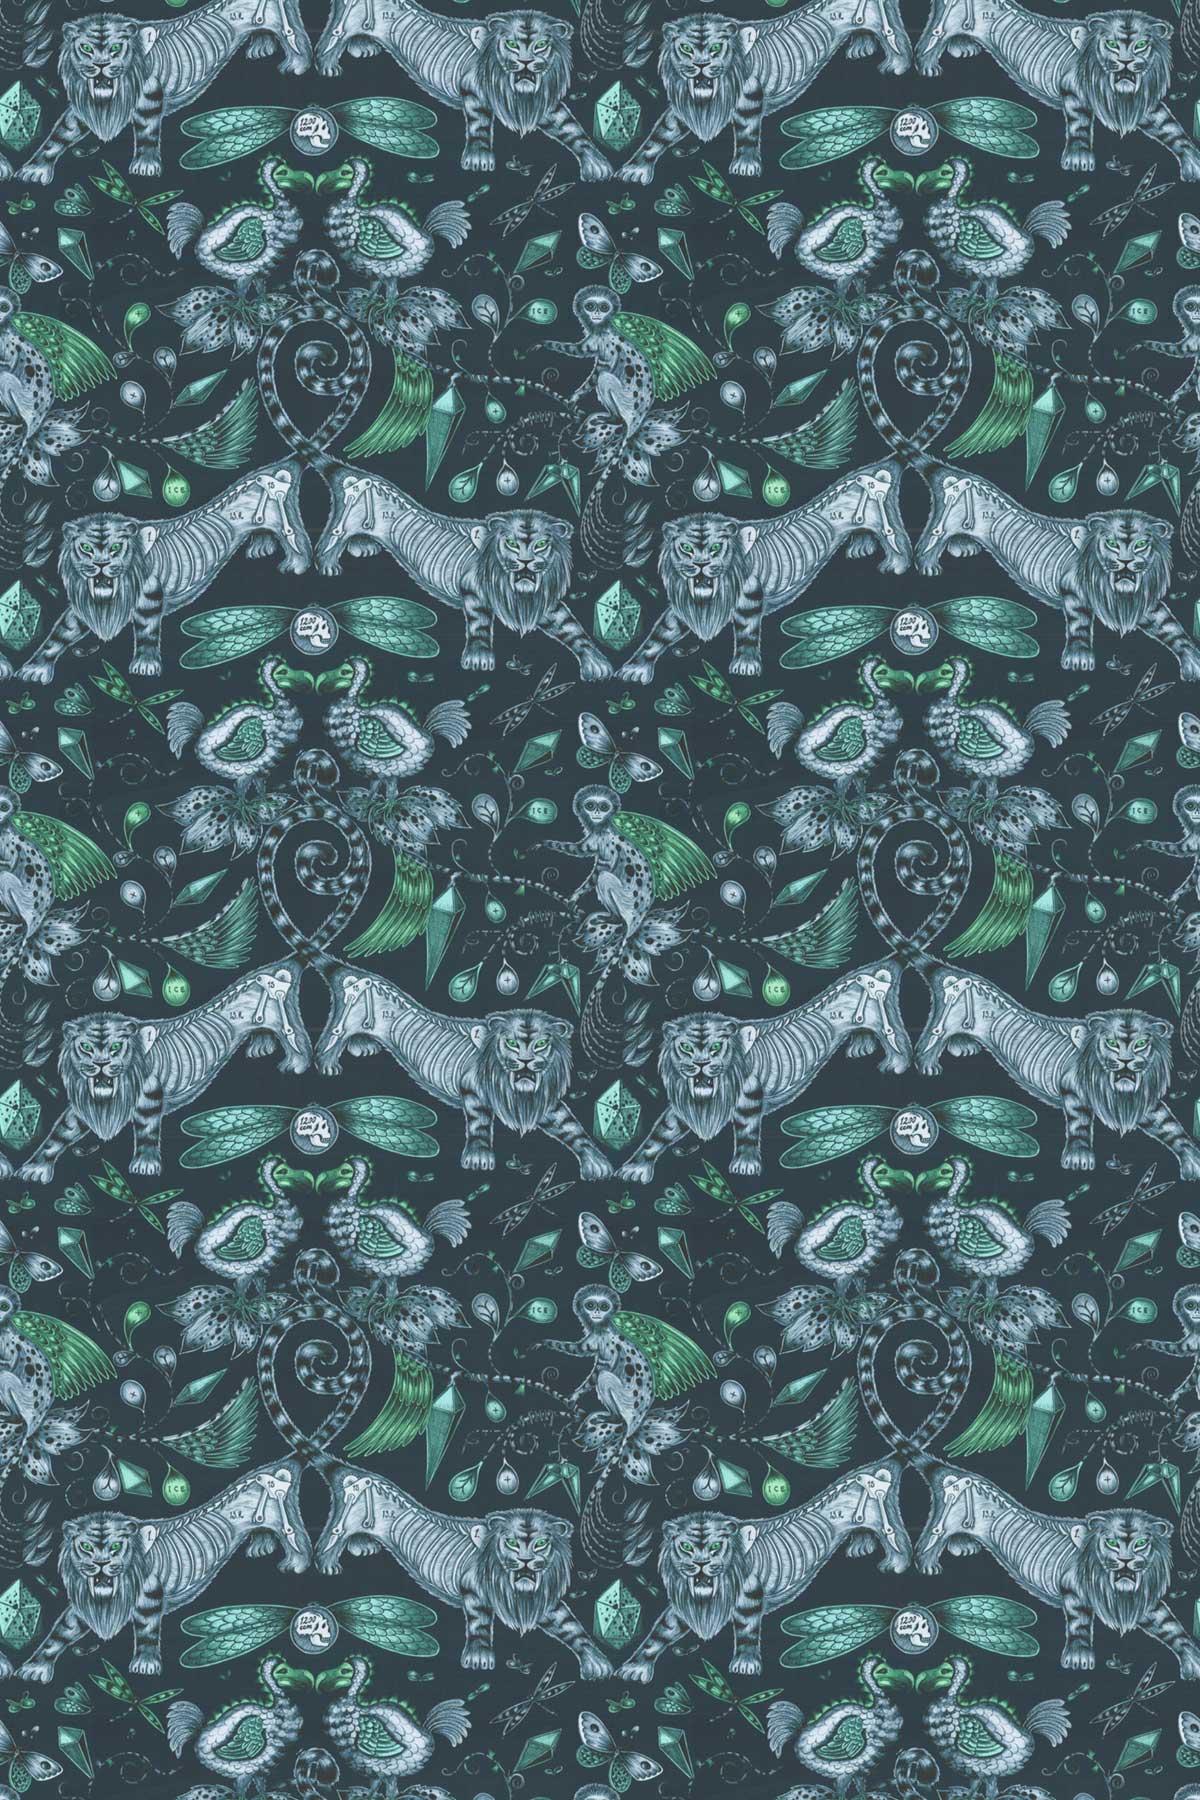 Extinct Fabric - Navy - by Emma J Shipley